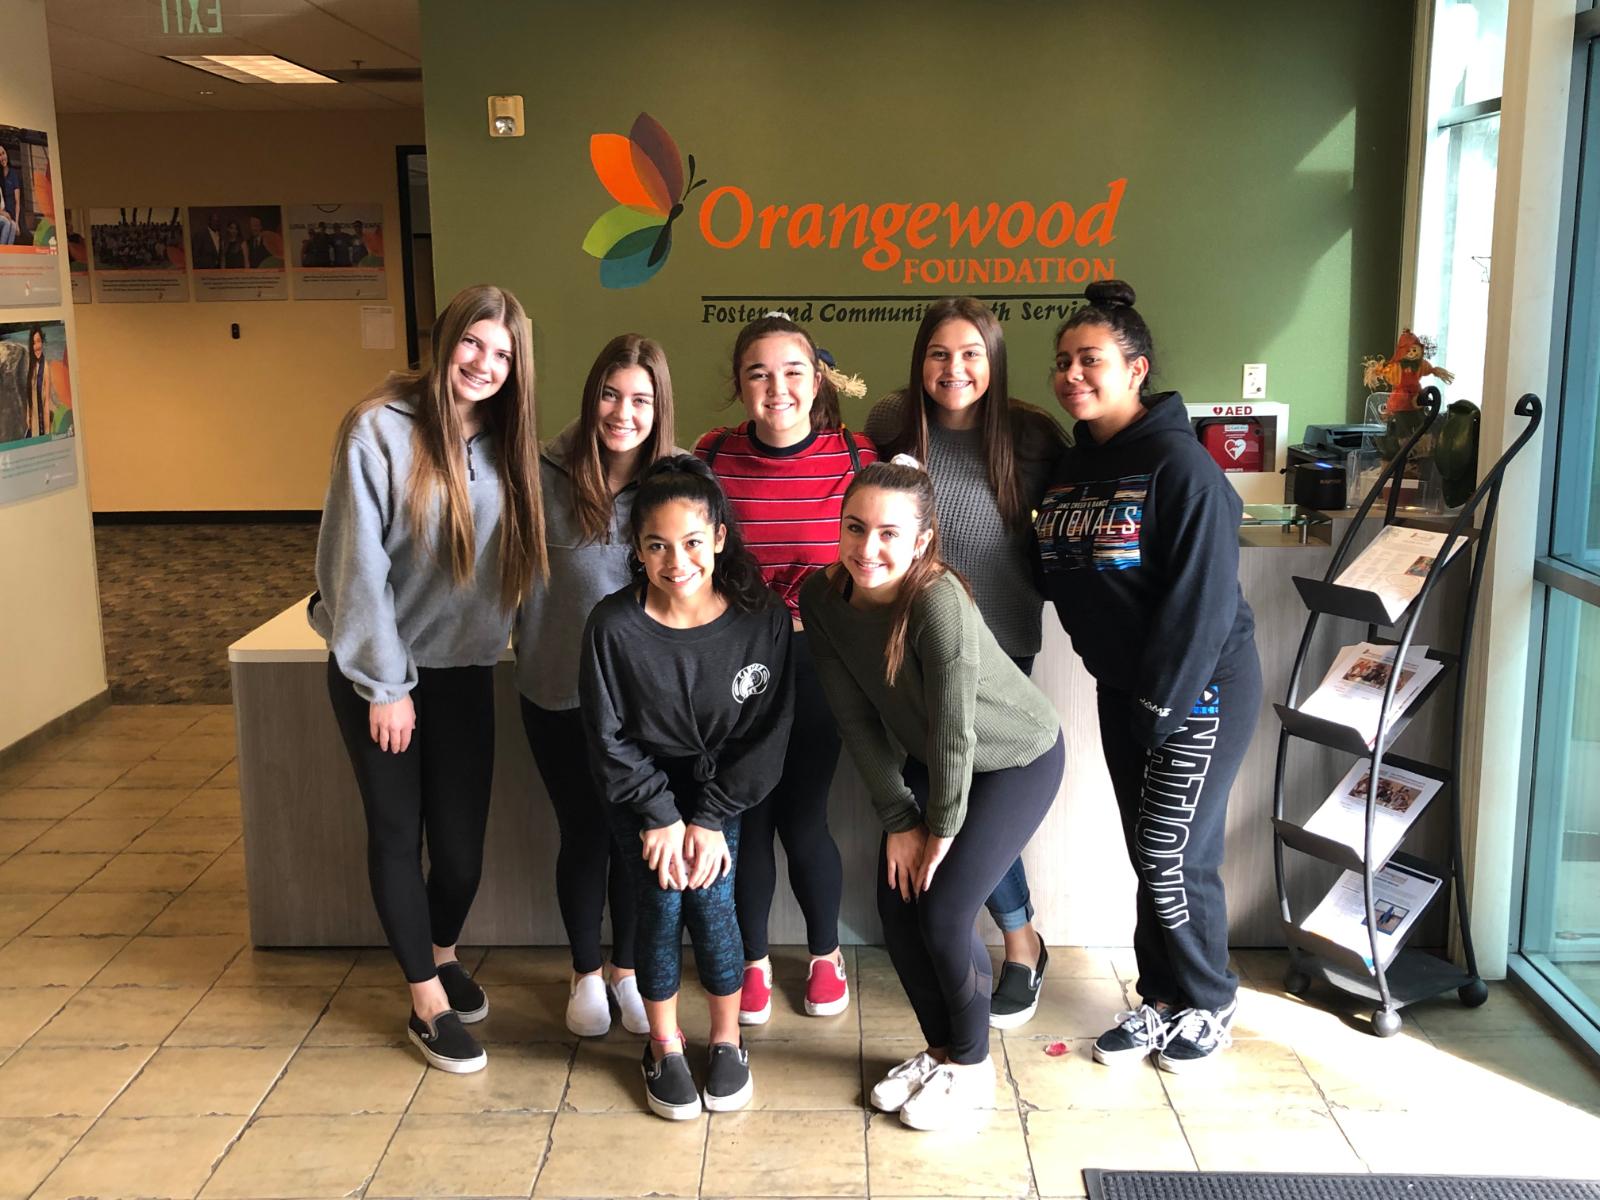 CHS Cheer & Ralphs team up for Orangewood food drive